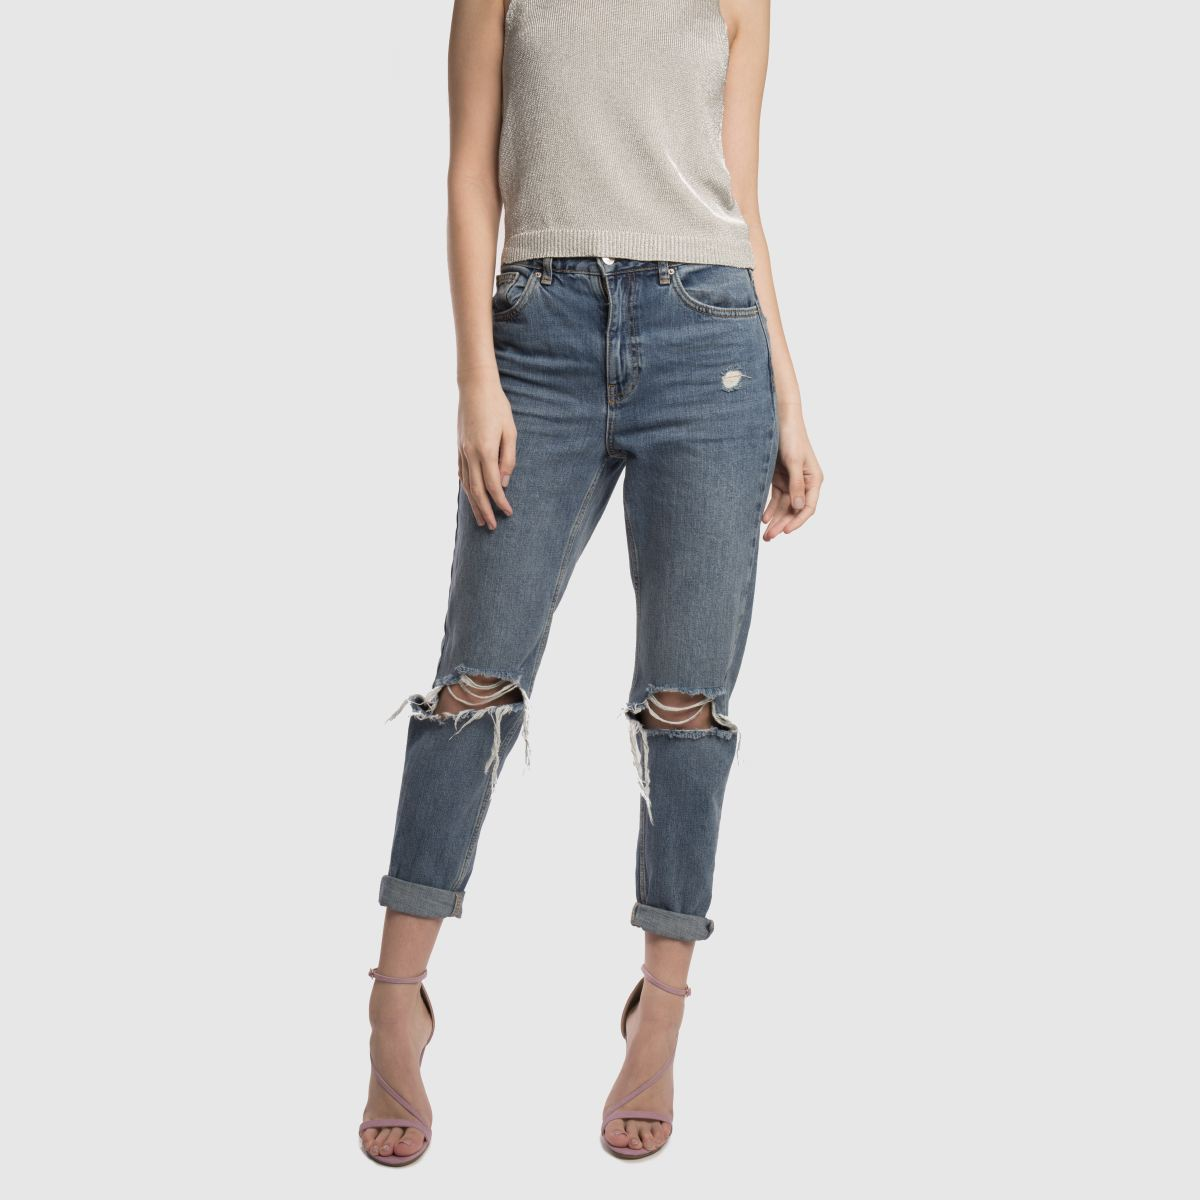 Damen Blaulila Gute missguided Asymmetric Strappy High Heels | schuh Gute Blaulila Qualität beliebte Schuhe b521fb